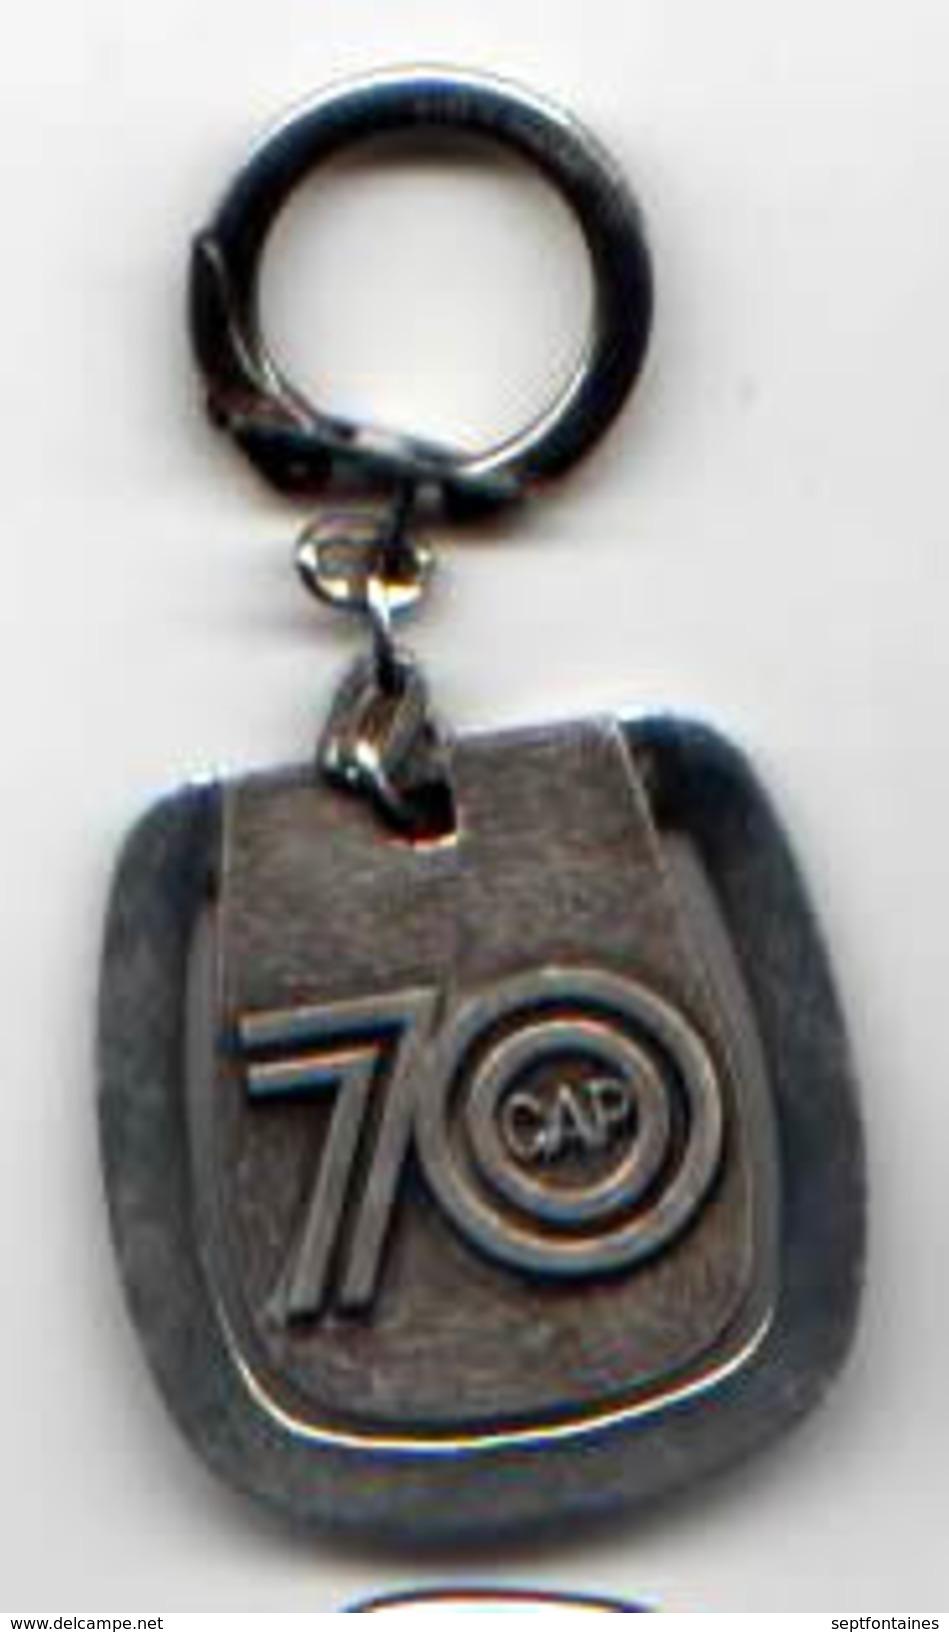 PORTE CLEF ANCIEN SIMCA CAP 70 ASSOCIE DE CHRYSLER - Key-rings